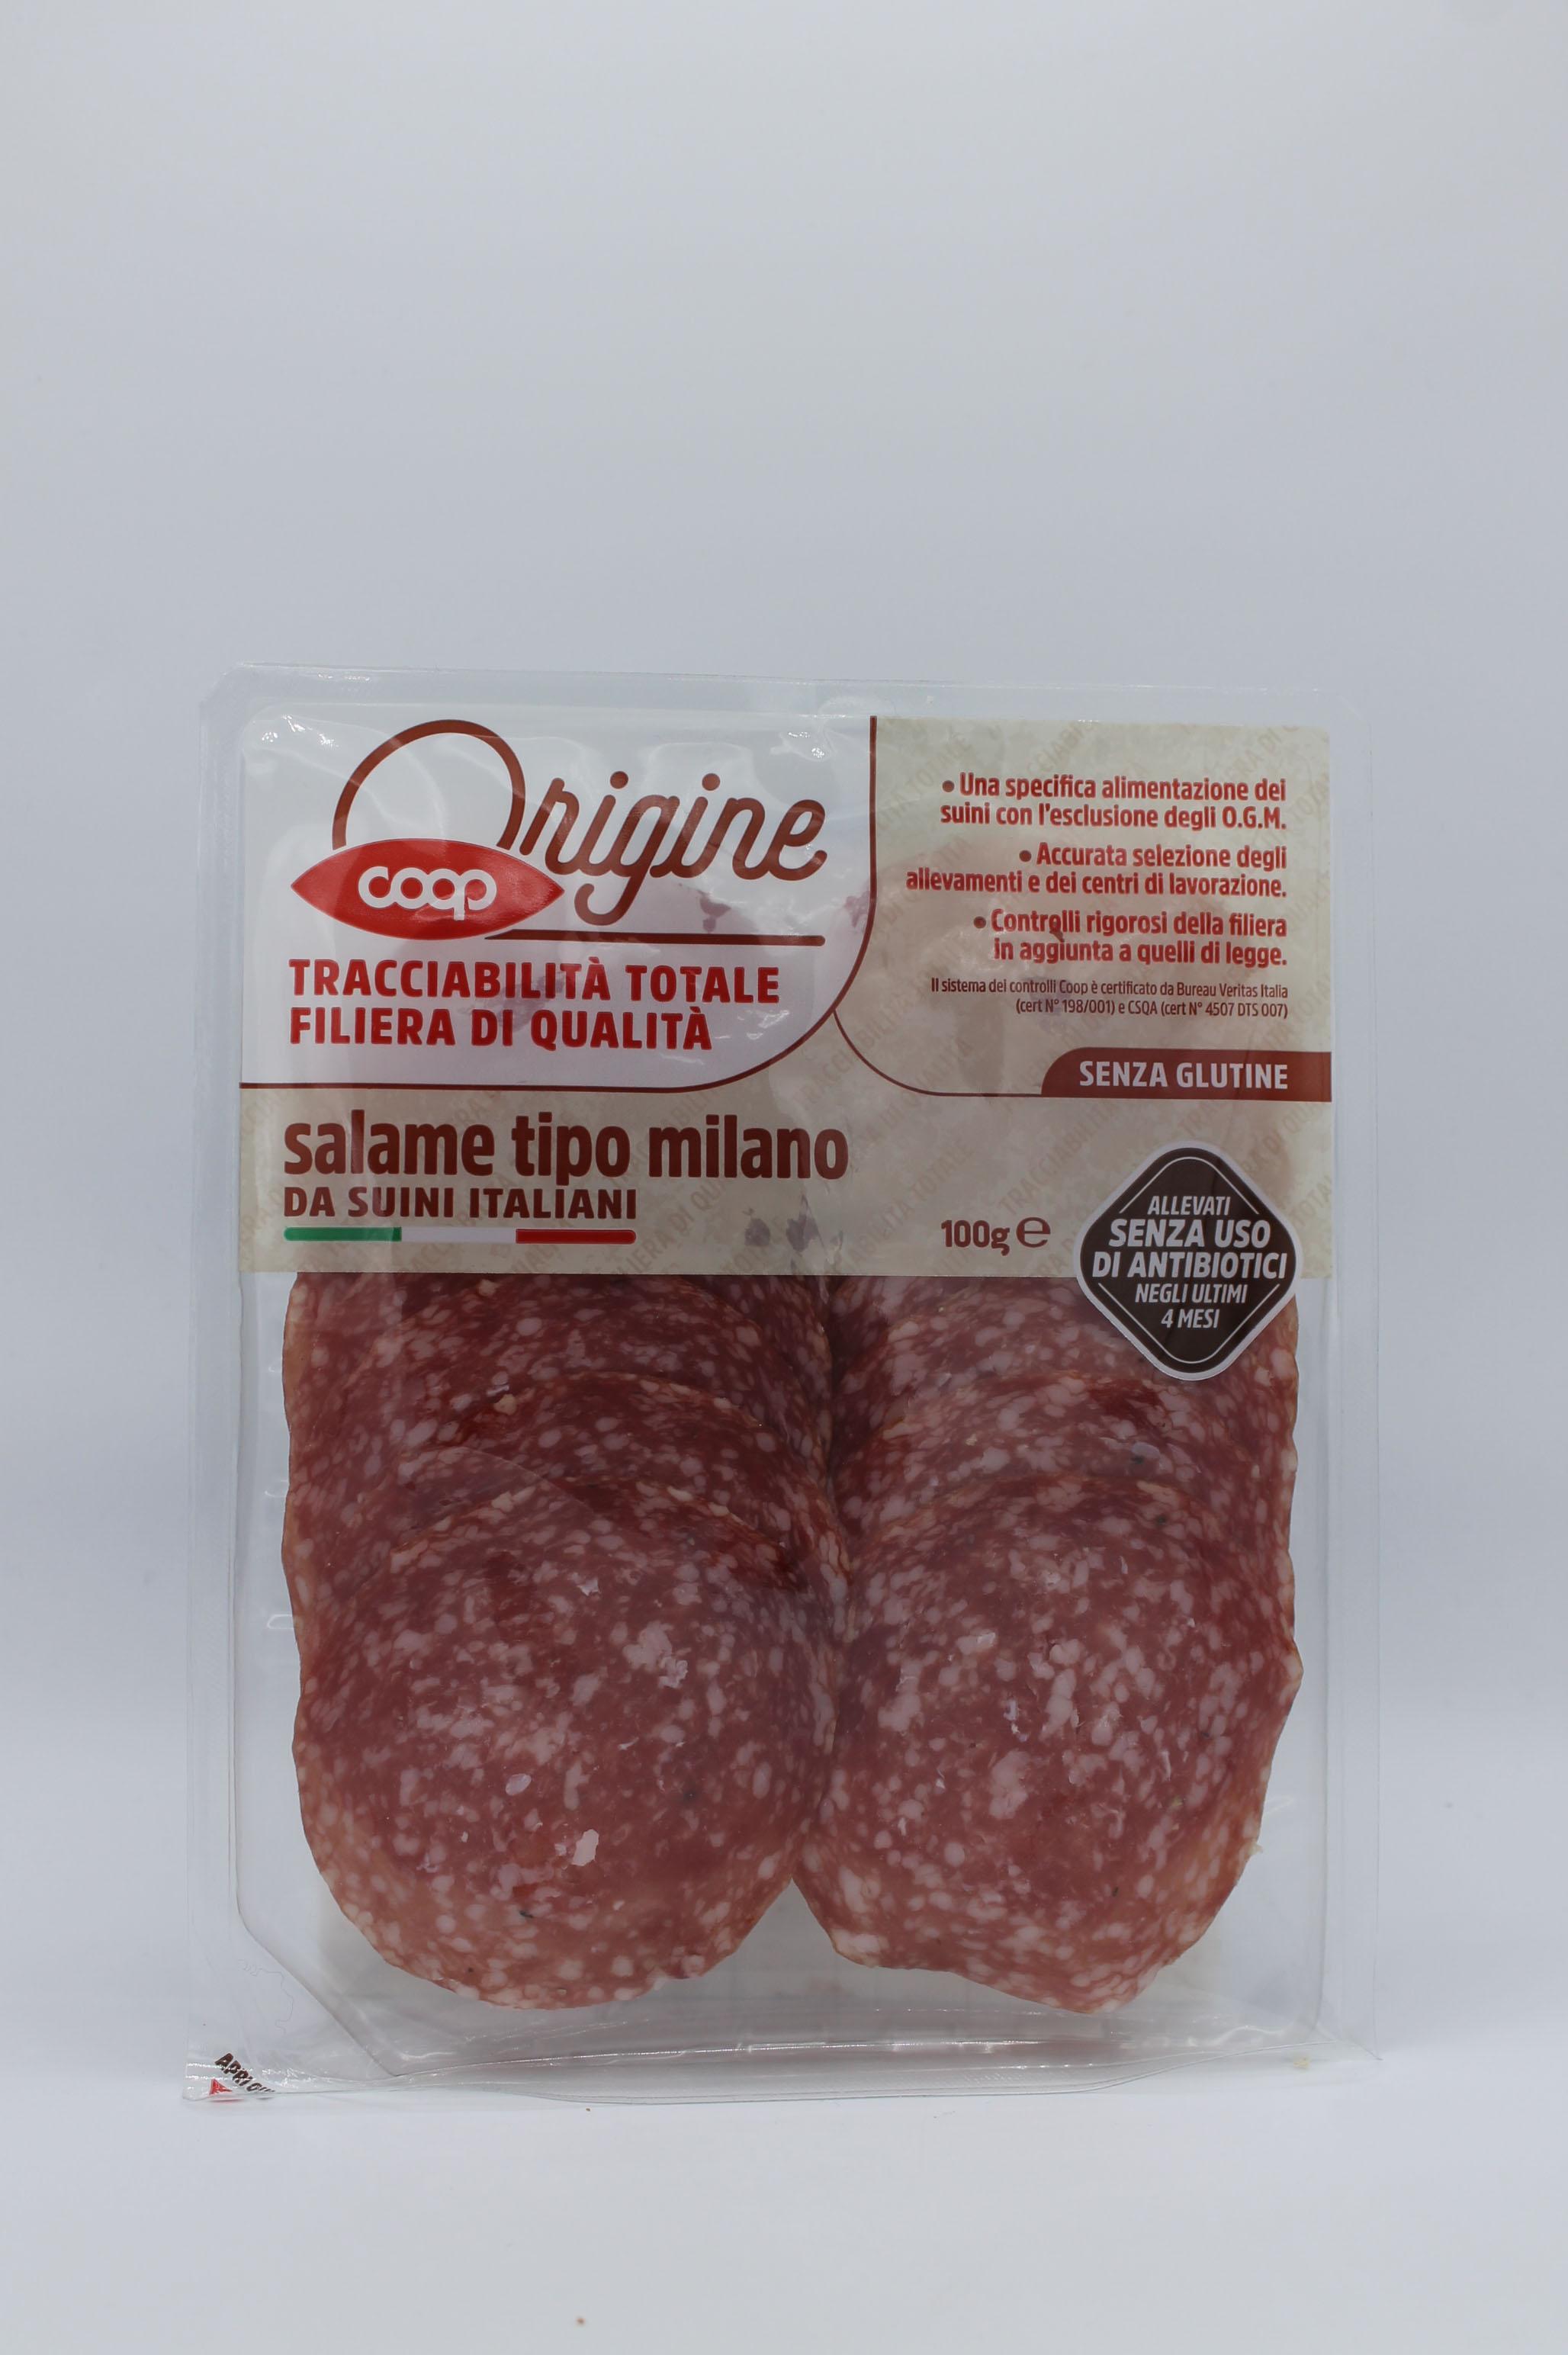 Coop origine salame milano 100gr.